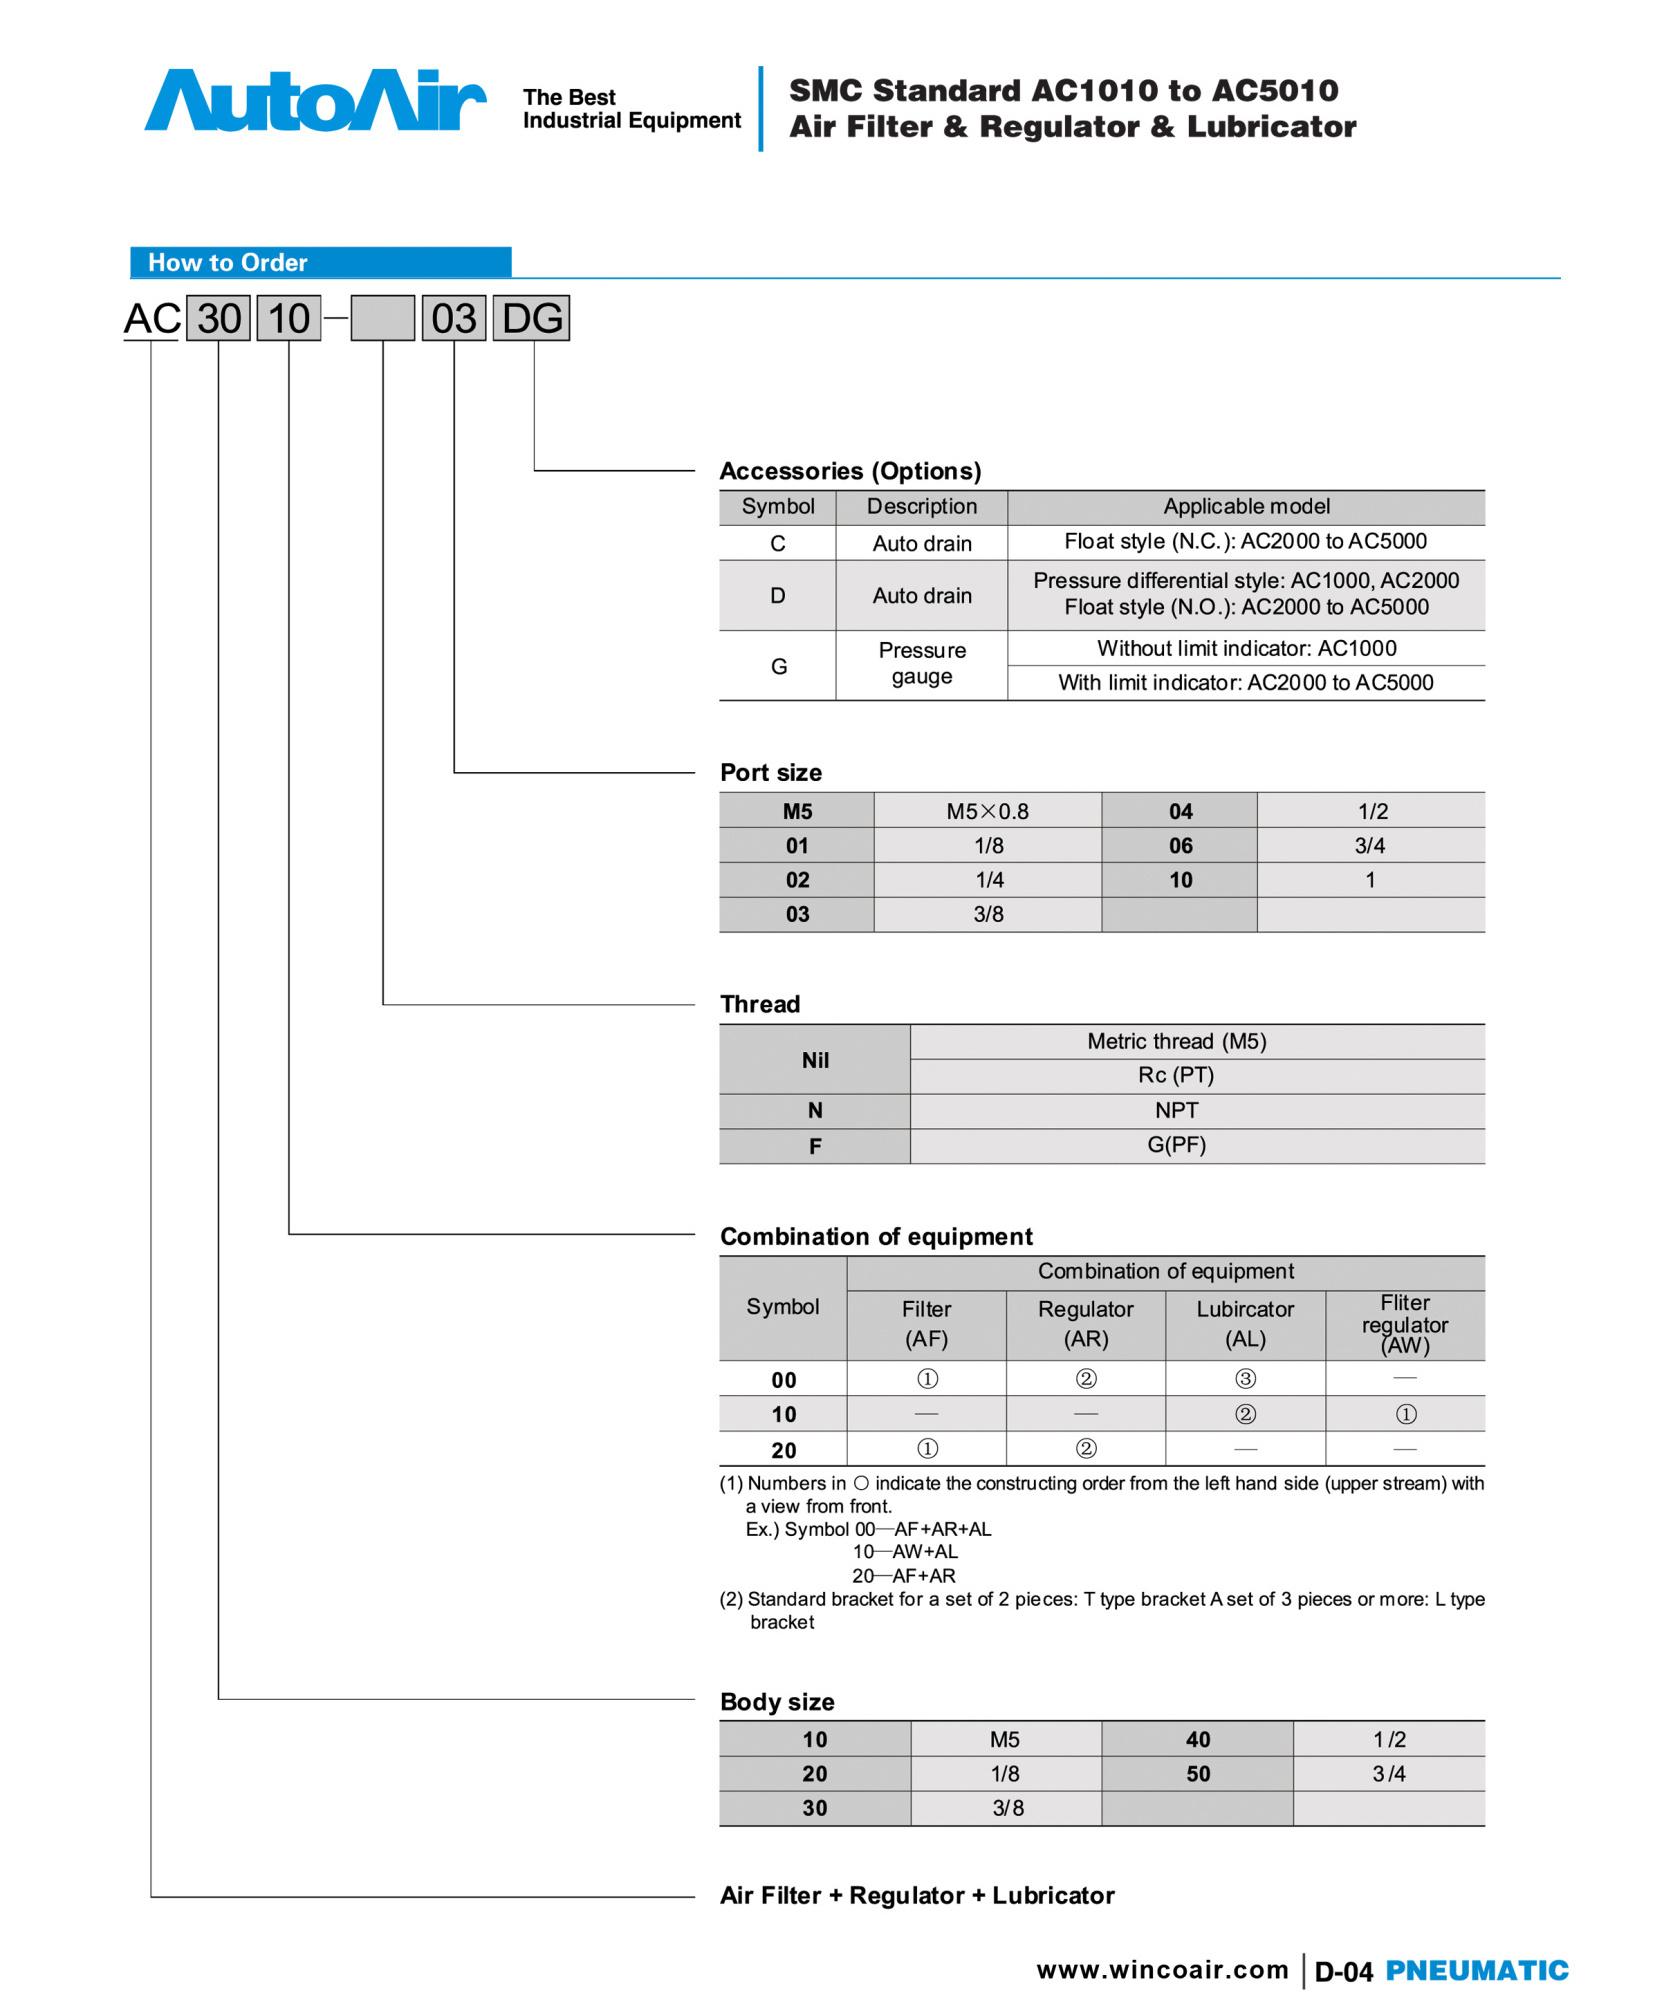 Modular Frl Smc Air Filter Regulator Lubricator